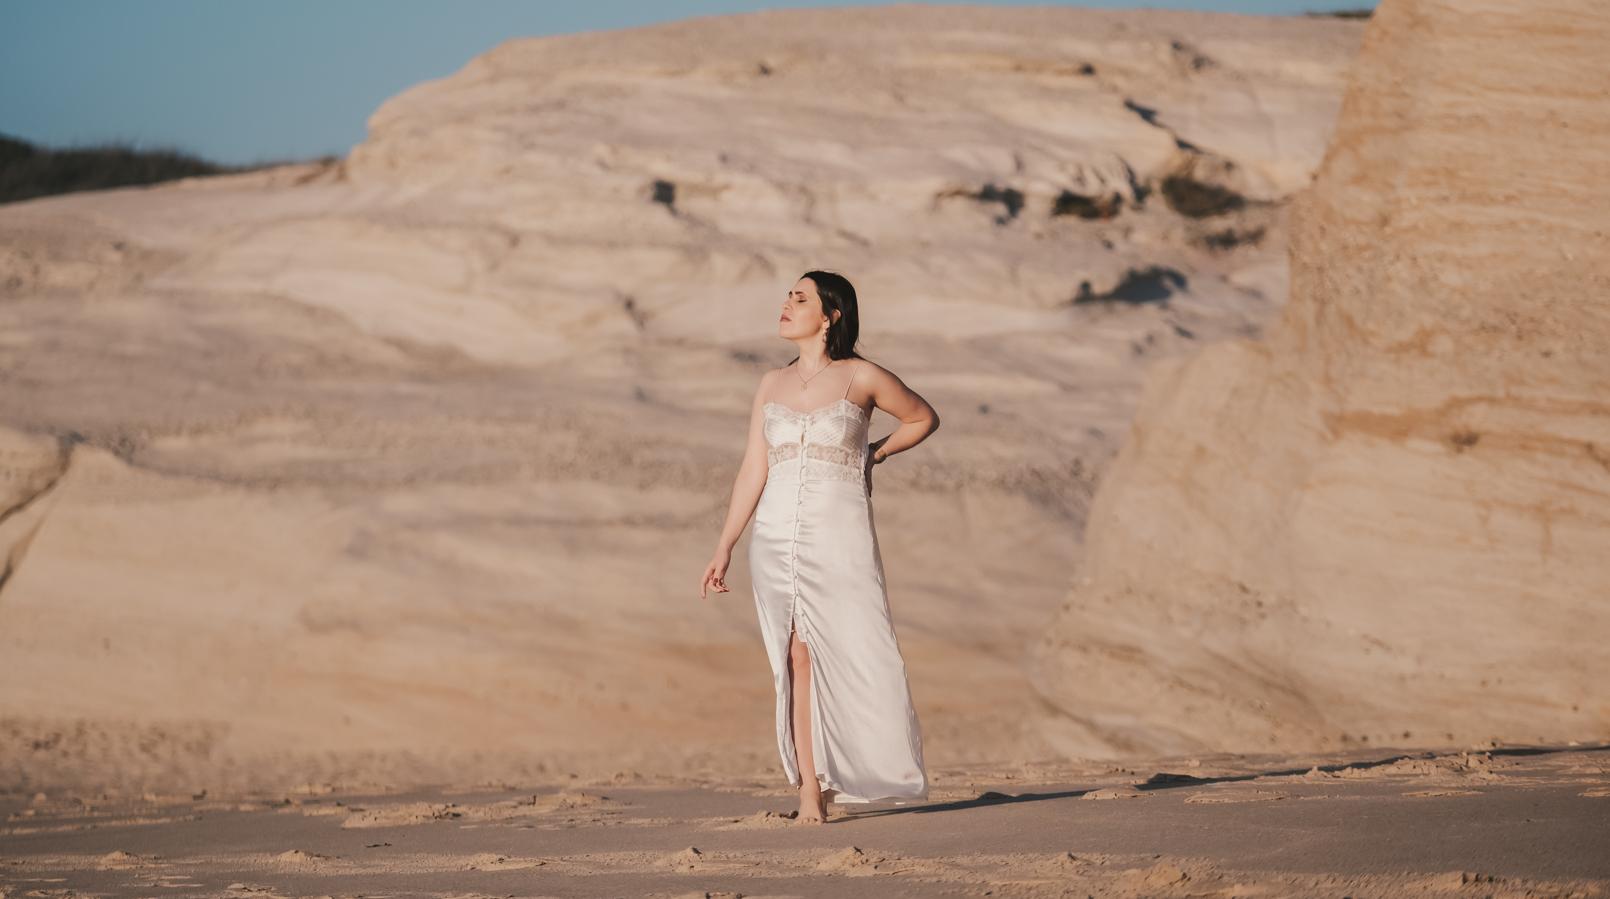 Le Fashionaire Pessoal: Há paz na solidão vestido cetim renda branco estilo lingerie zara brincos dourados cristal swarovski praia 8408F PT